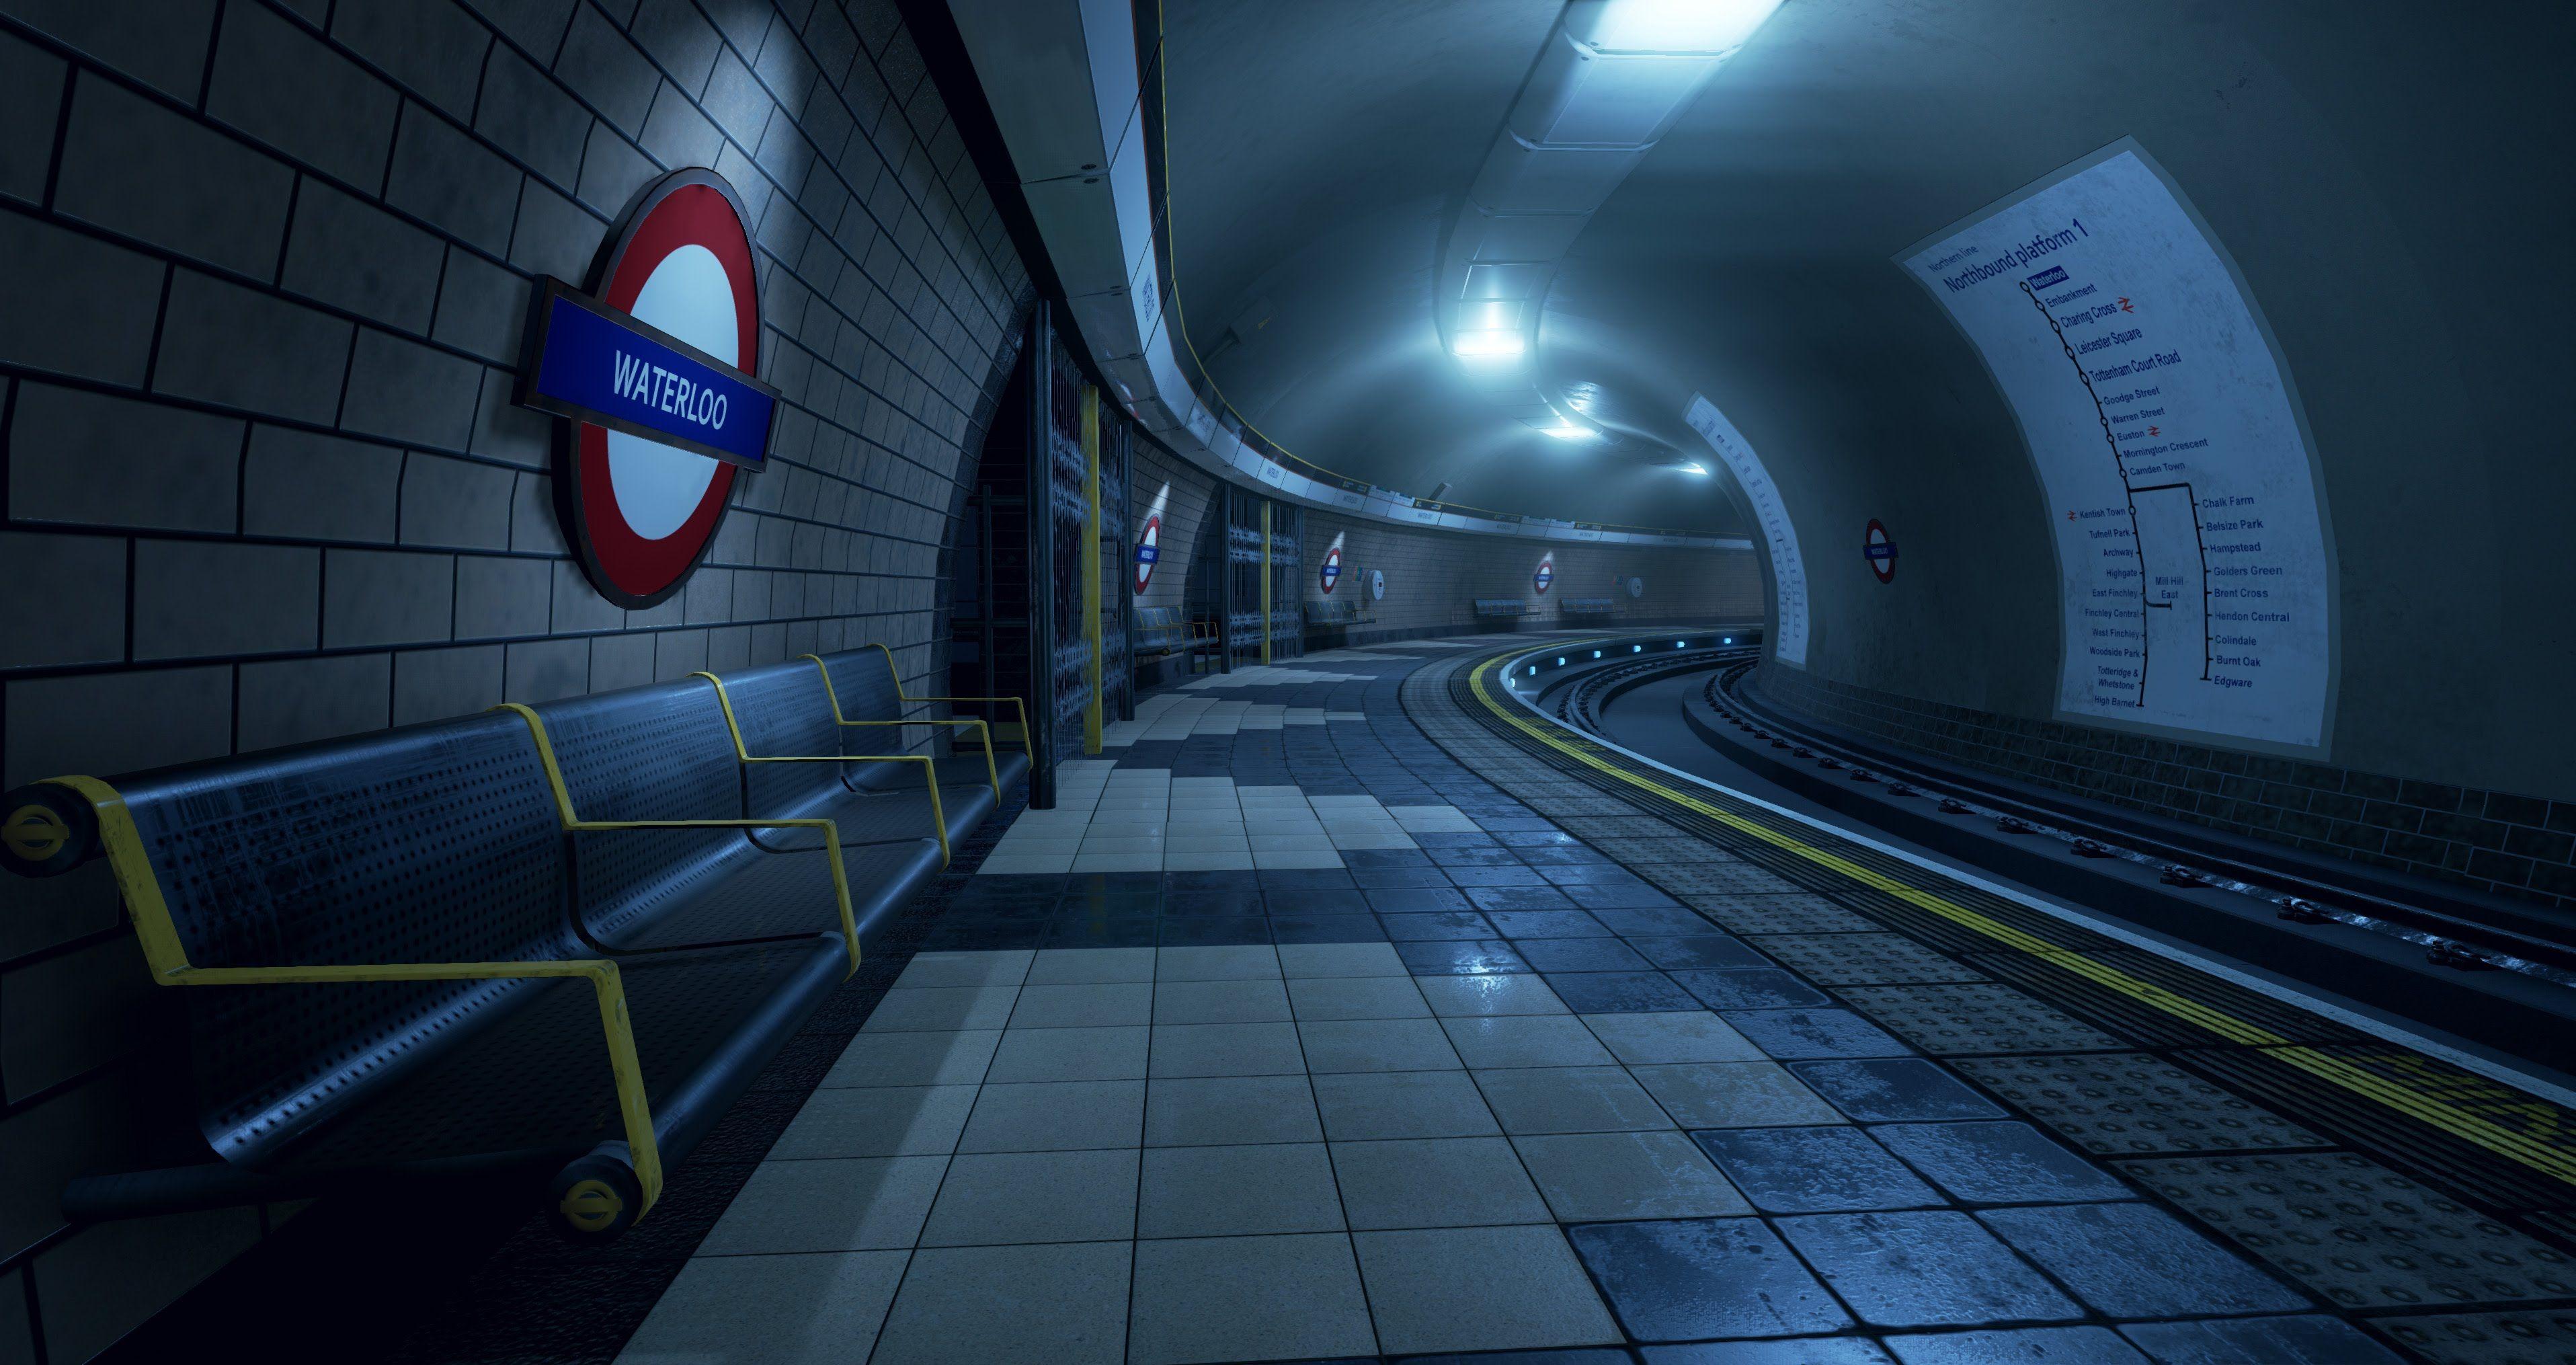 London Underground - Unreal Engine 4 | Neat Game Development